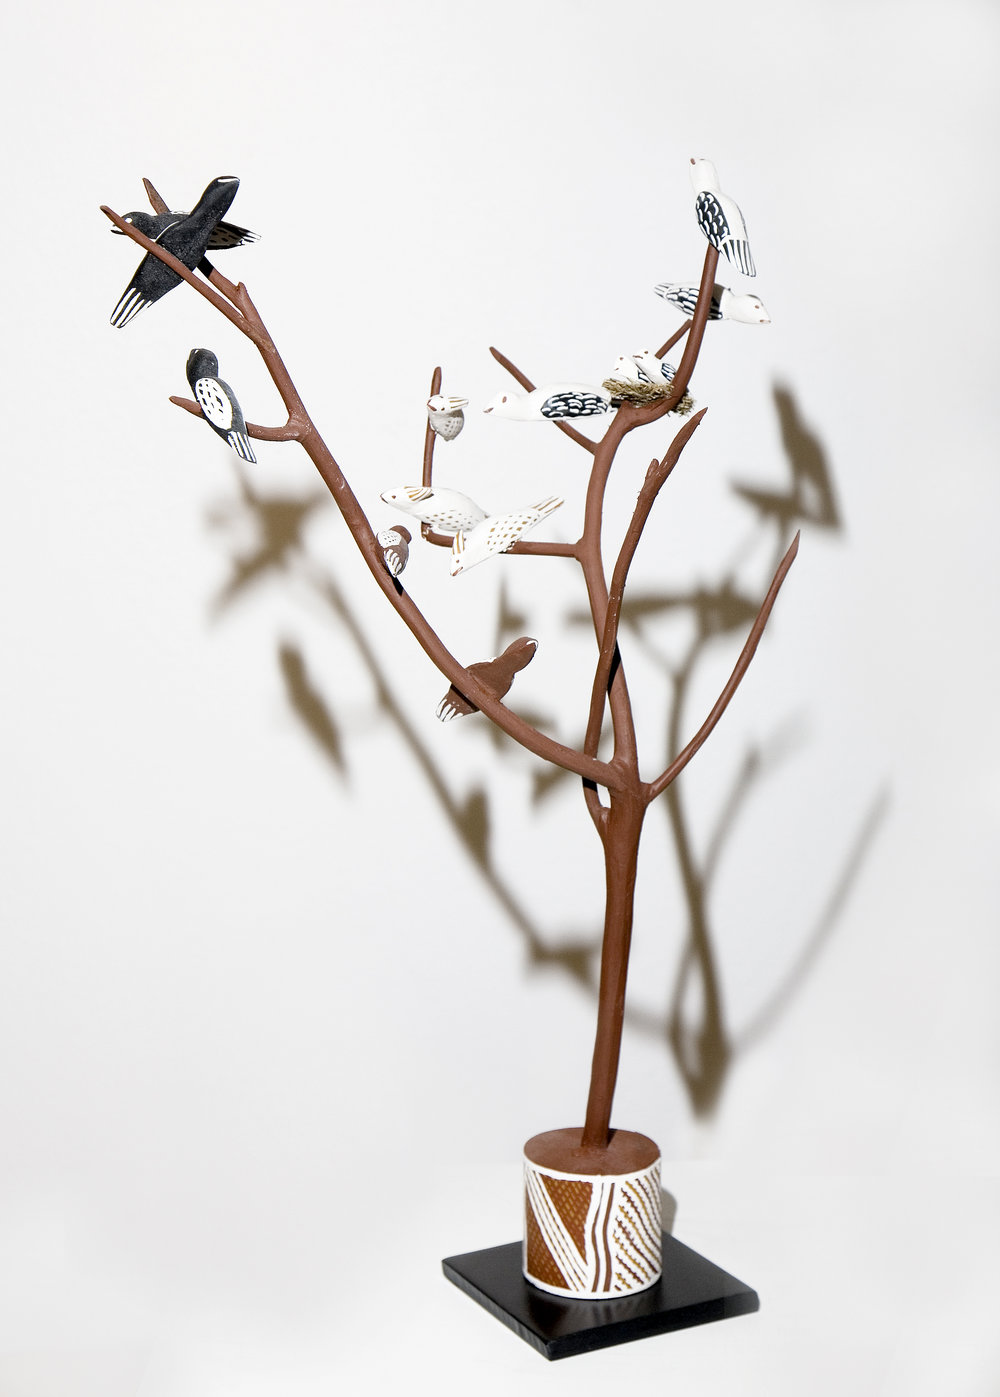 Naminapu Maymuru-White  Bird Tree  Natural earth pigments on hibiscus 75 cm Buku Larrnggay Mulka #4265K   EMAIL INQUIRY